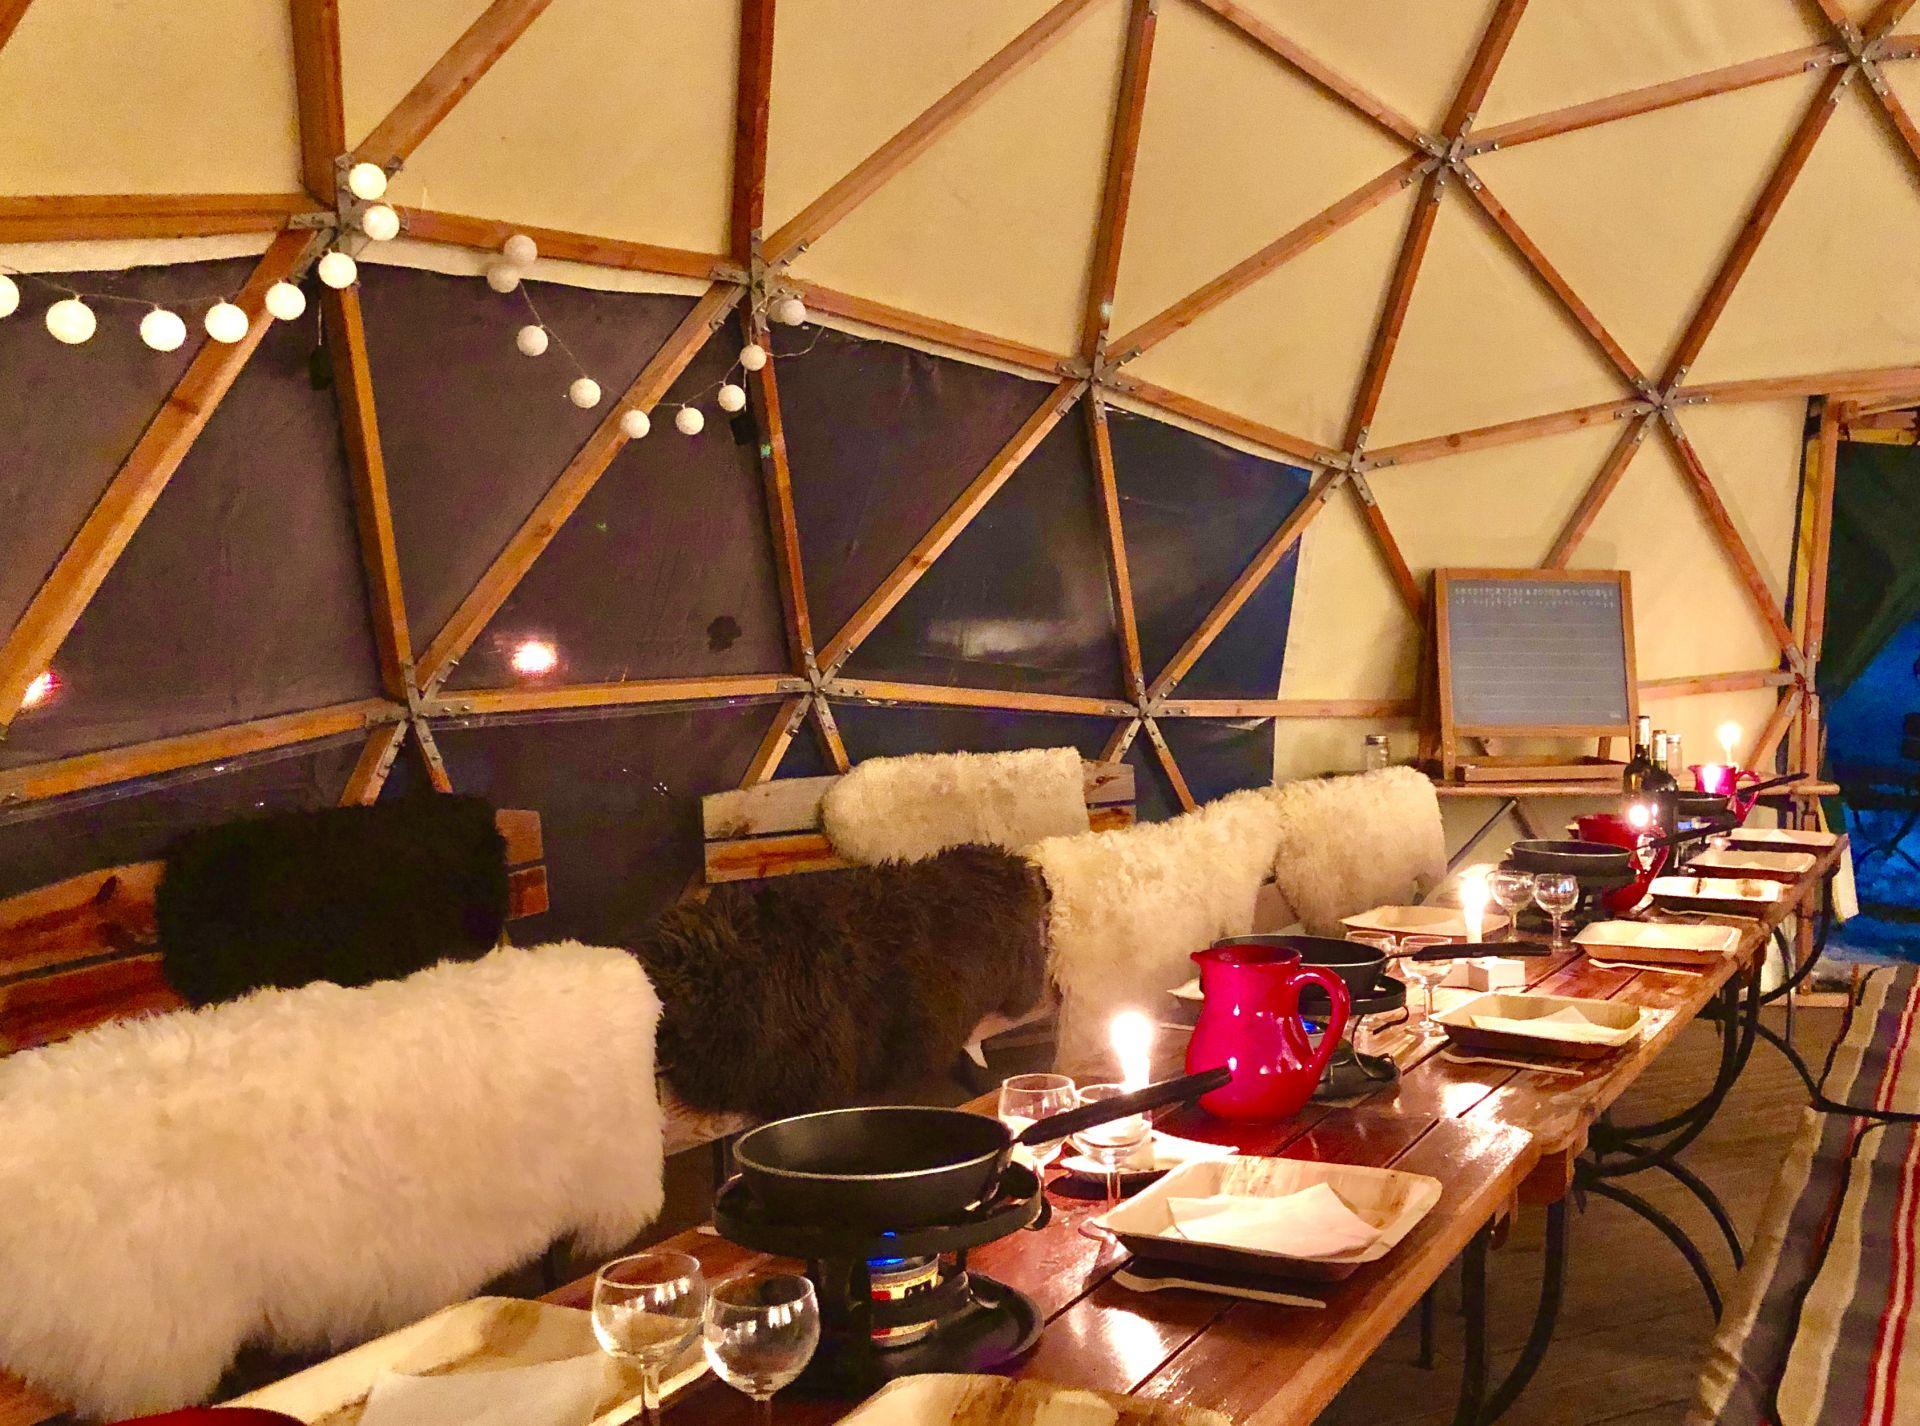 raclette-dome-igloo-cheminée -autrans-